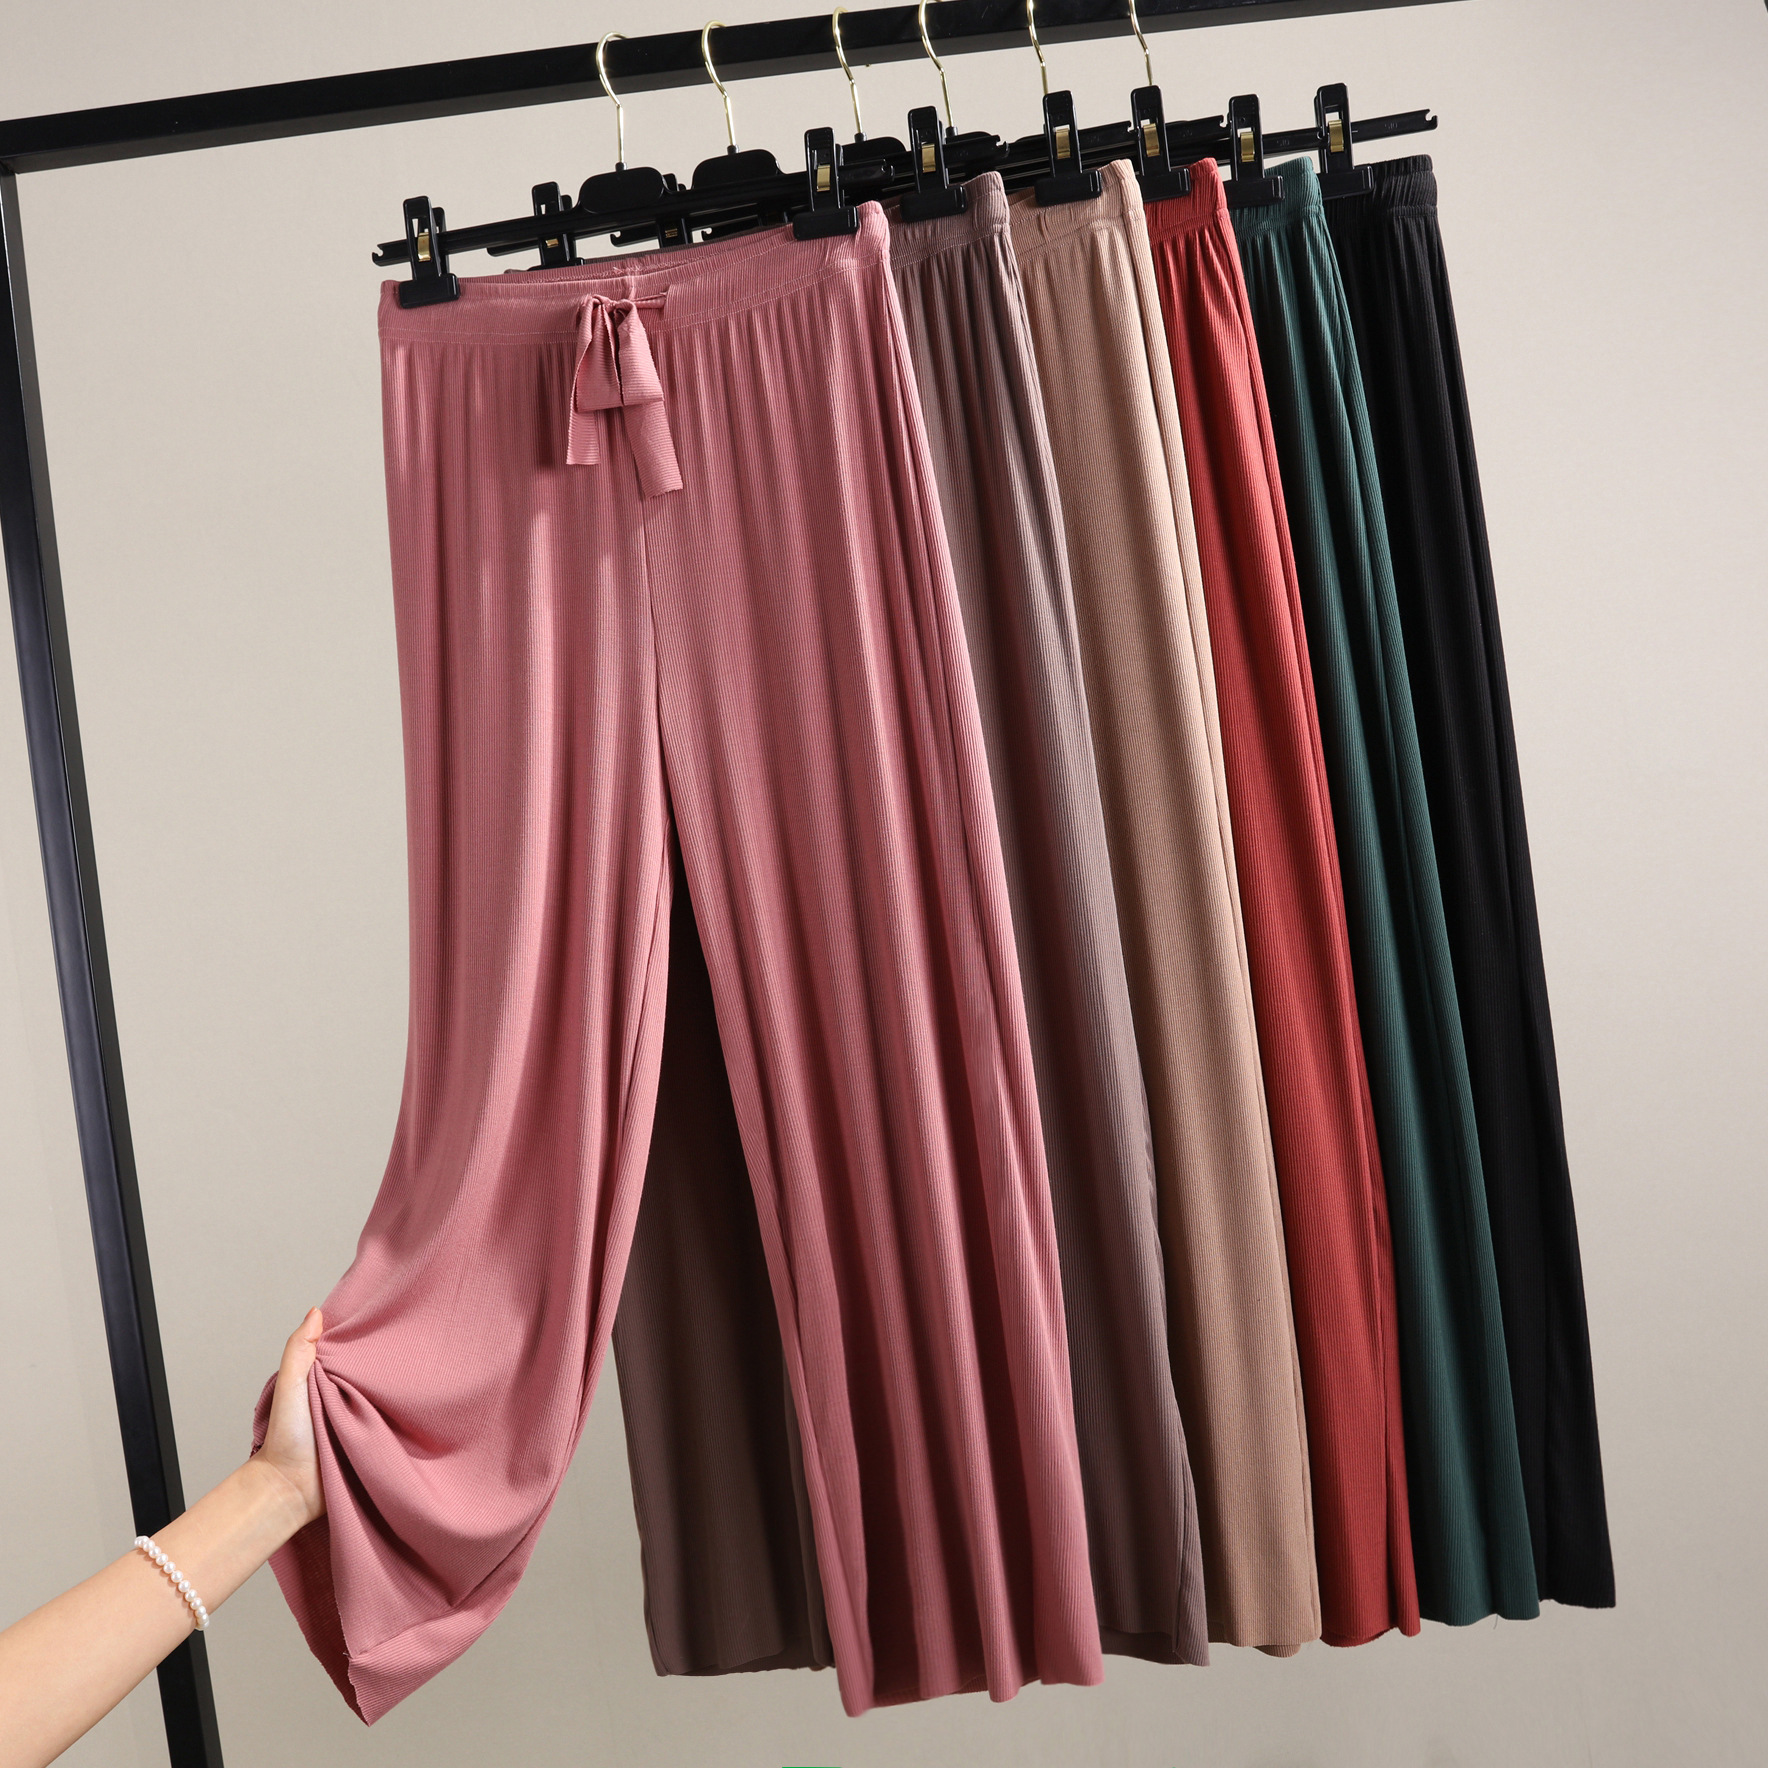 New Ribbed Cotton Wide Leg Pants Korean Version Of The Wild Nine Pants Loose Wide Leg Pants Female Summer Sense High Waist Pants